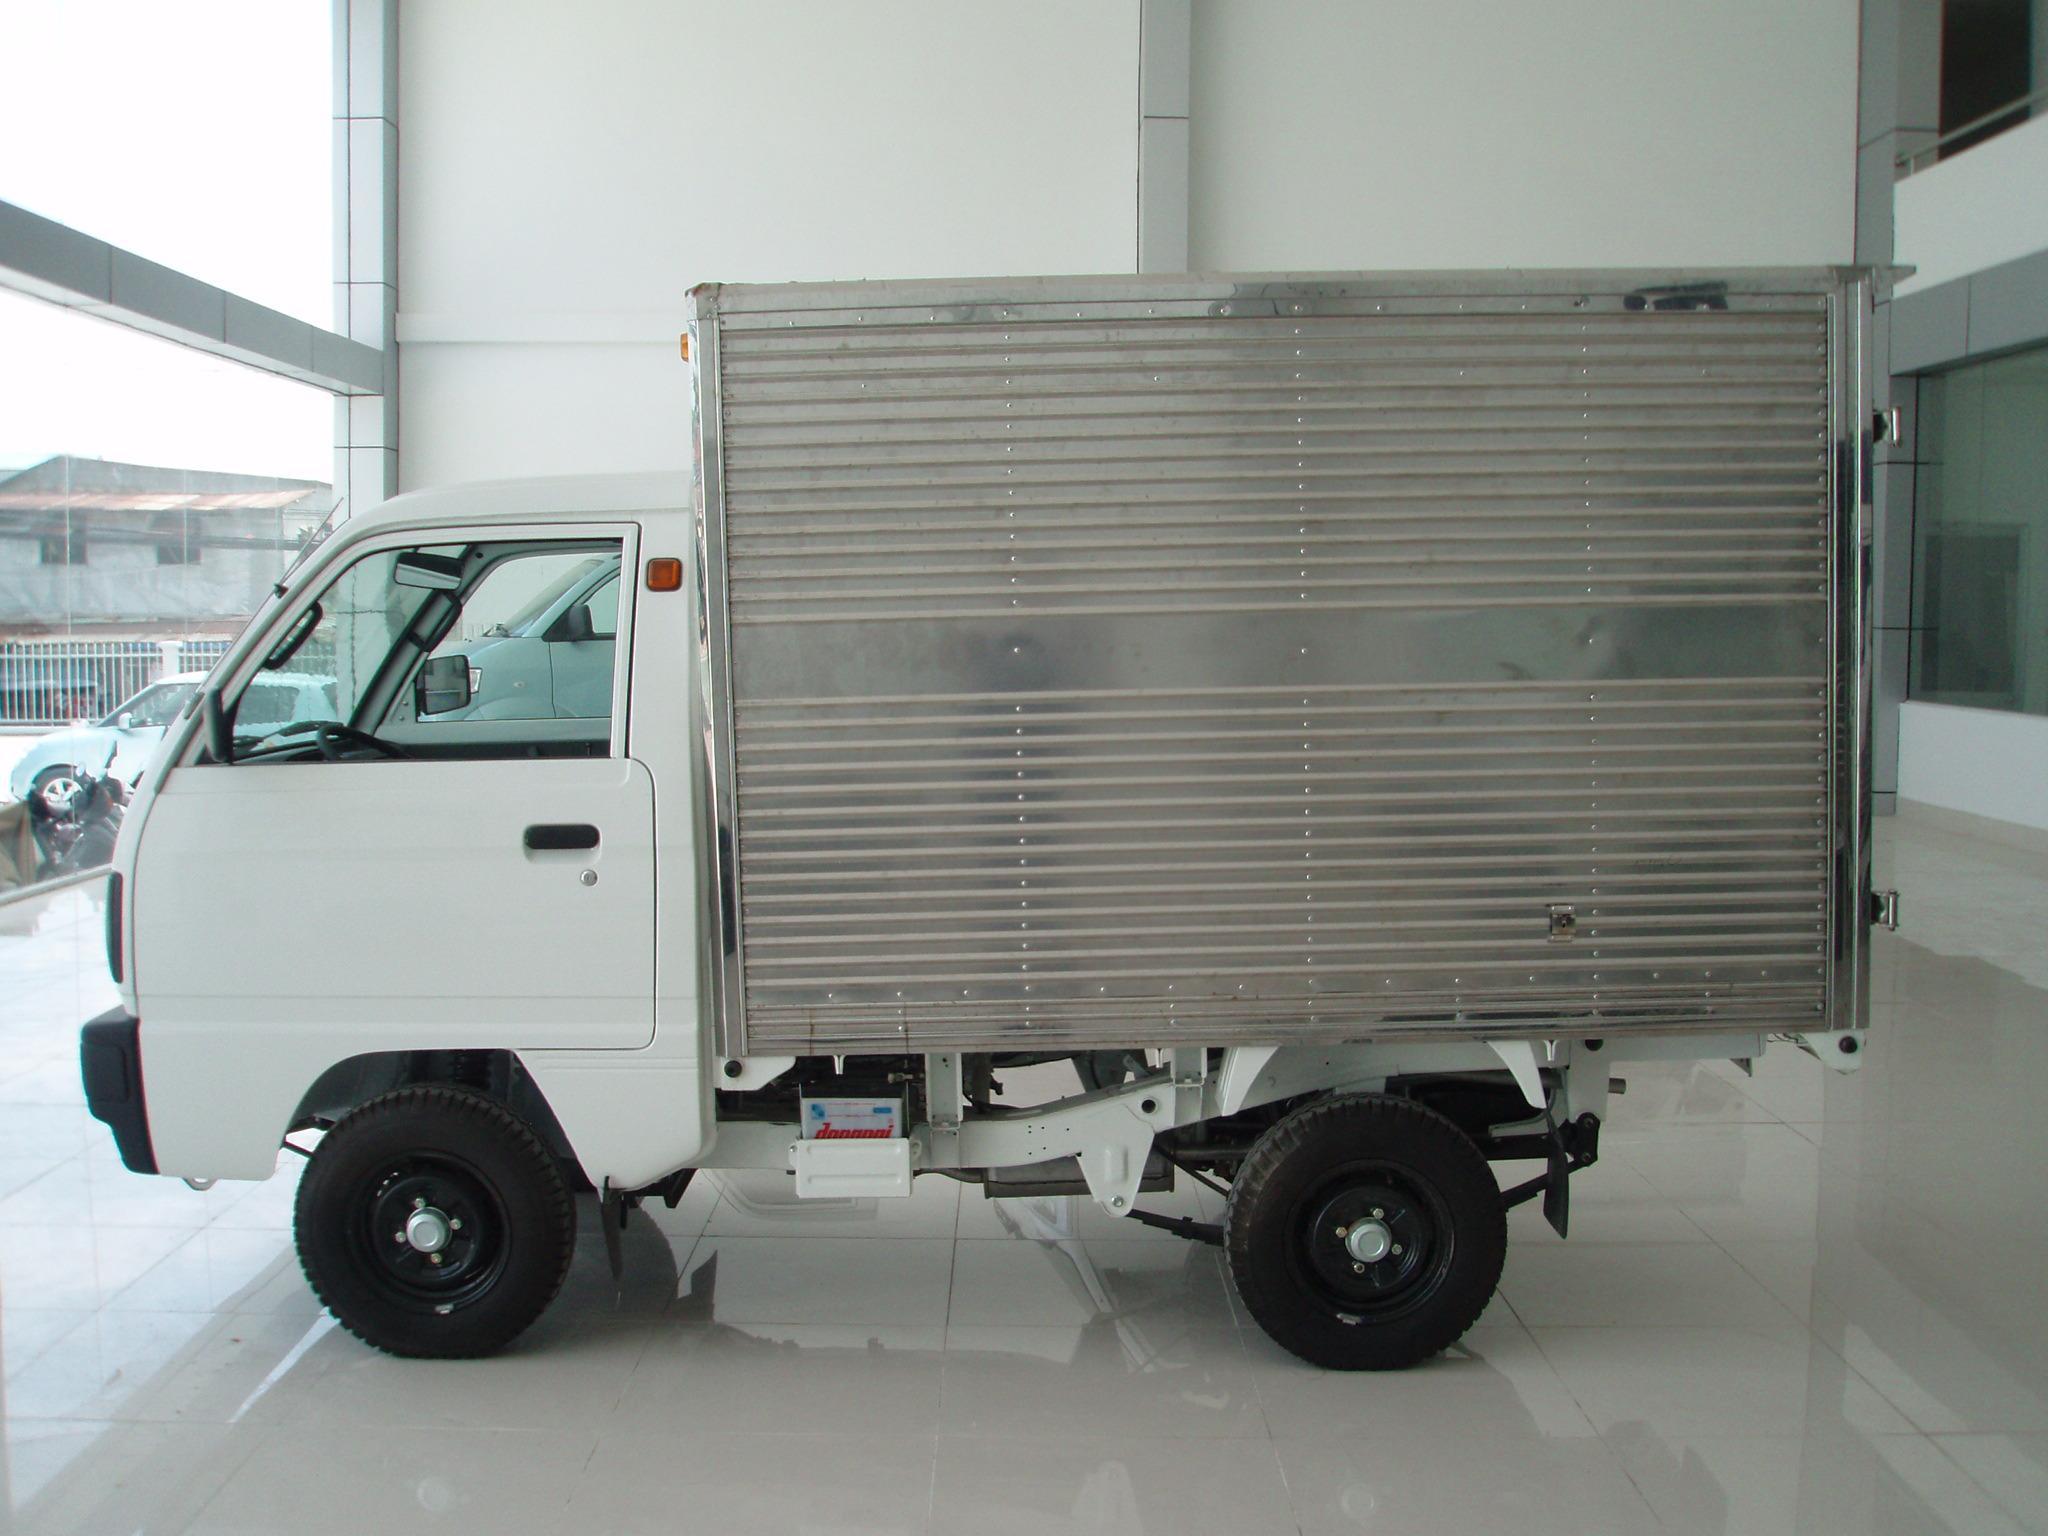 suzuki supper carry pro tai muaxegiabeo - Suzuki Carry [hienthinam]: giá xe và khuyến mãi tháng [hienthithang]